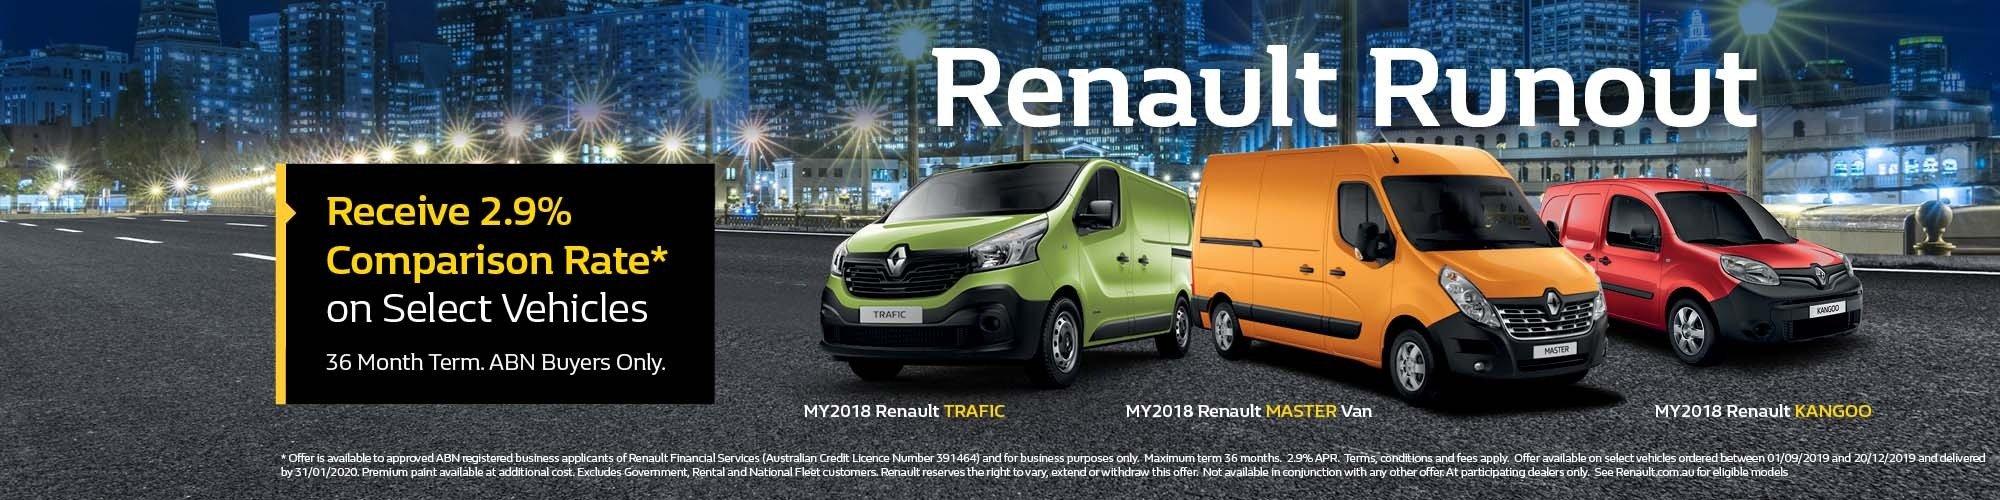 Suttons City Renault Runout